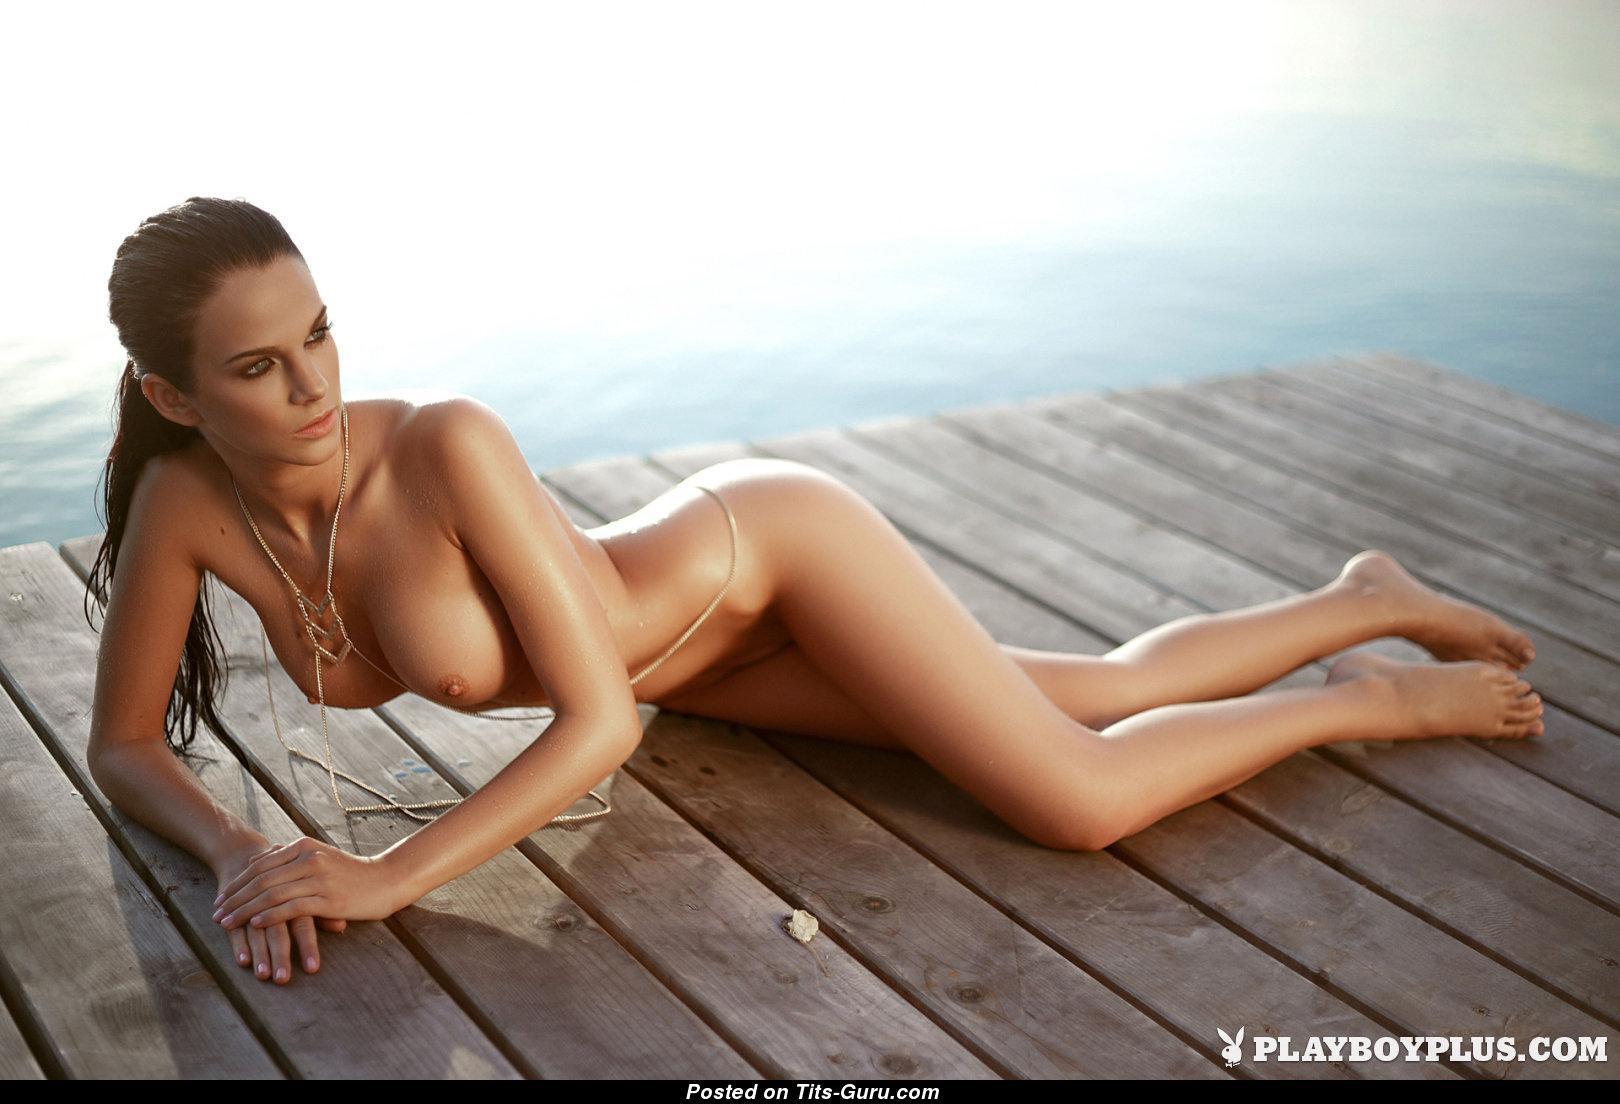 Sophie Herbert - Playboy Brunette With Bare Soft Knockers Amateur Sexual Pix 29042017 080600